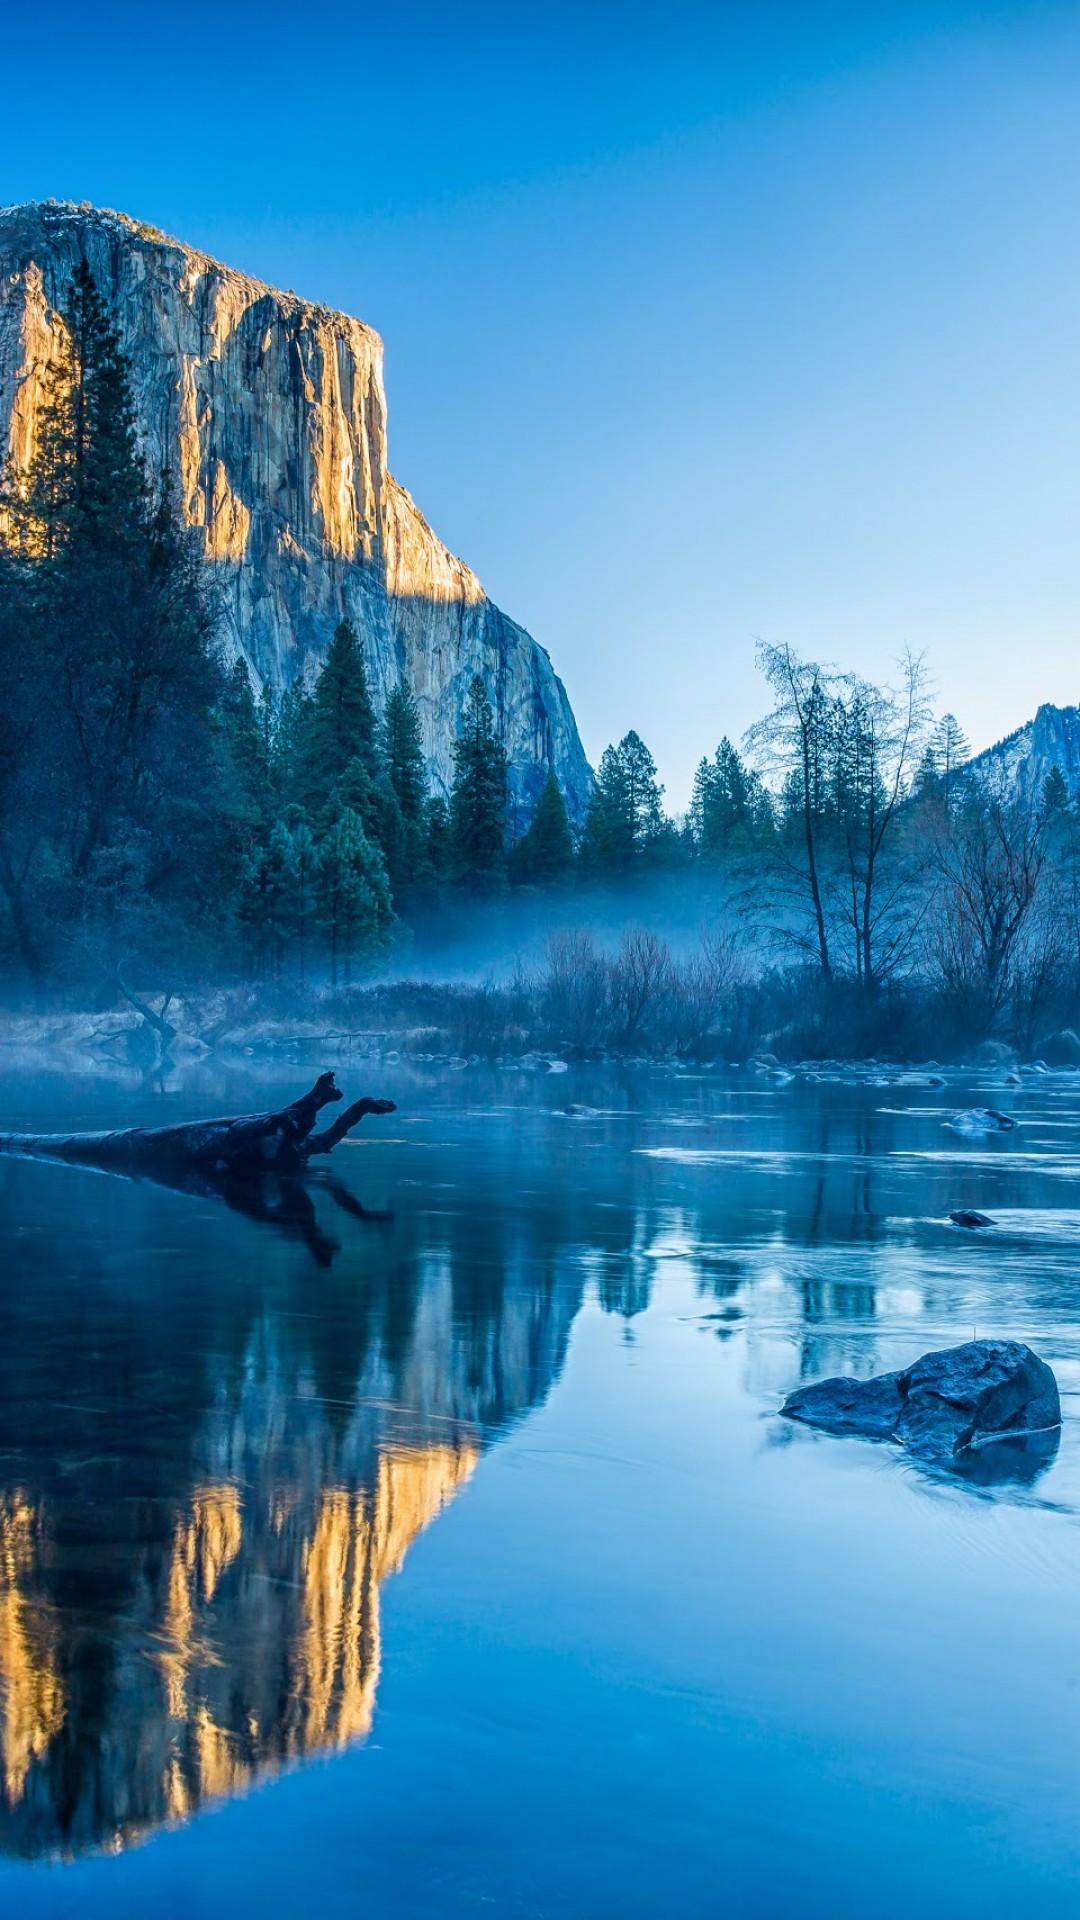 Niagara Falls Wallpaper Iphone Wallpaper Yosemite El Capitan Hd 4k Wallpaper Winter